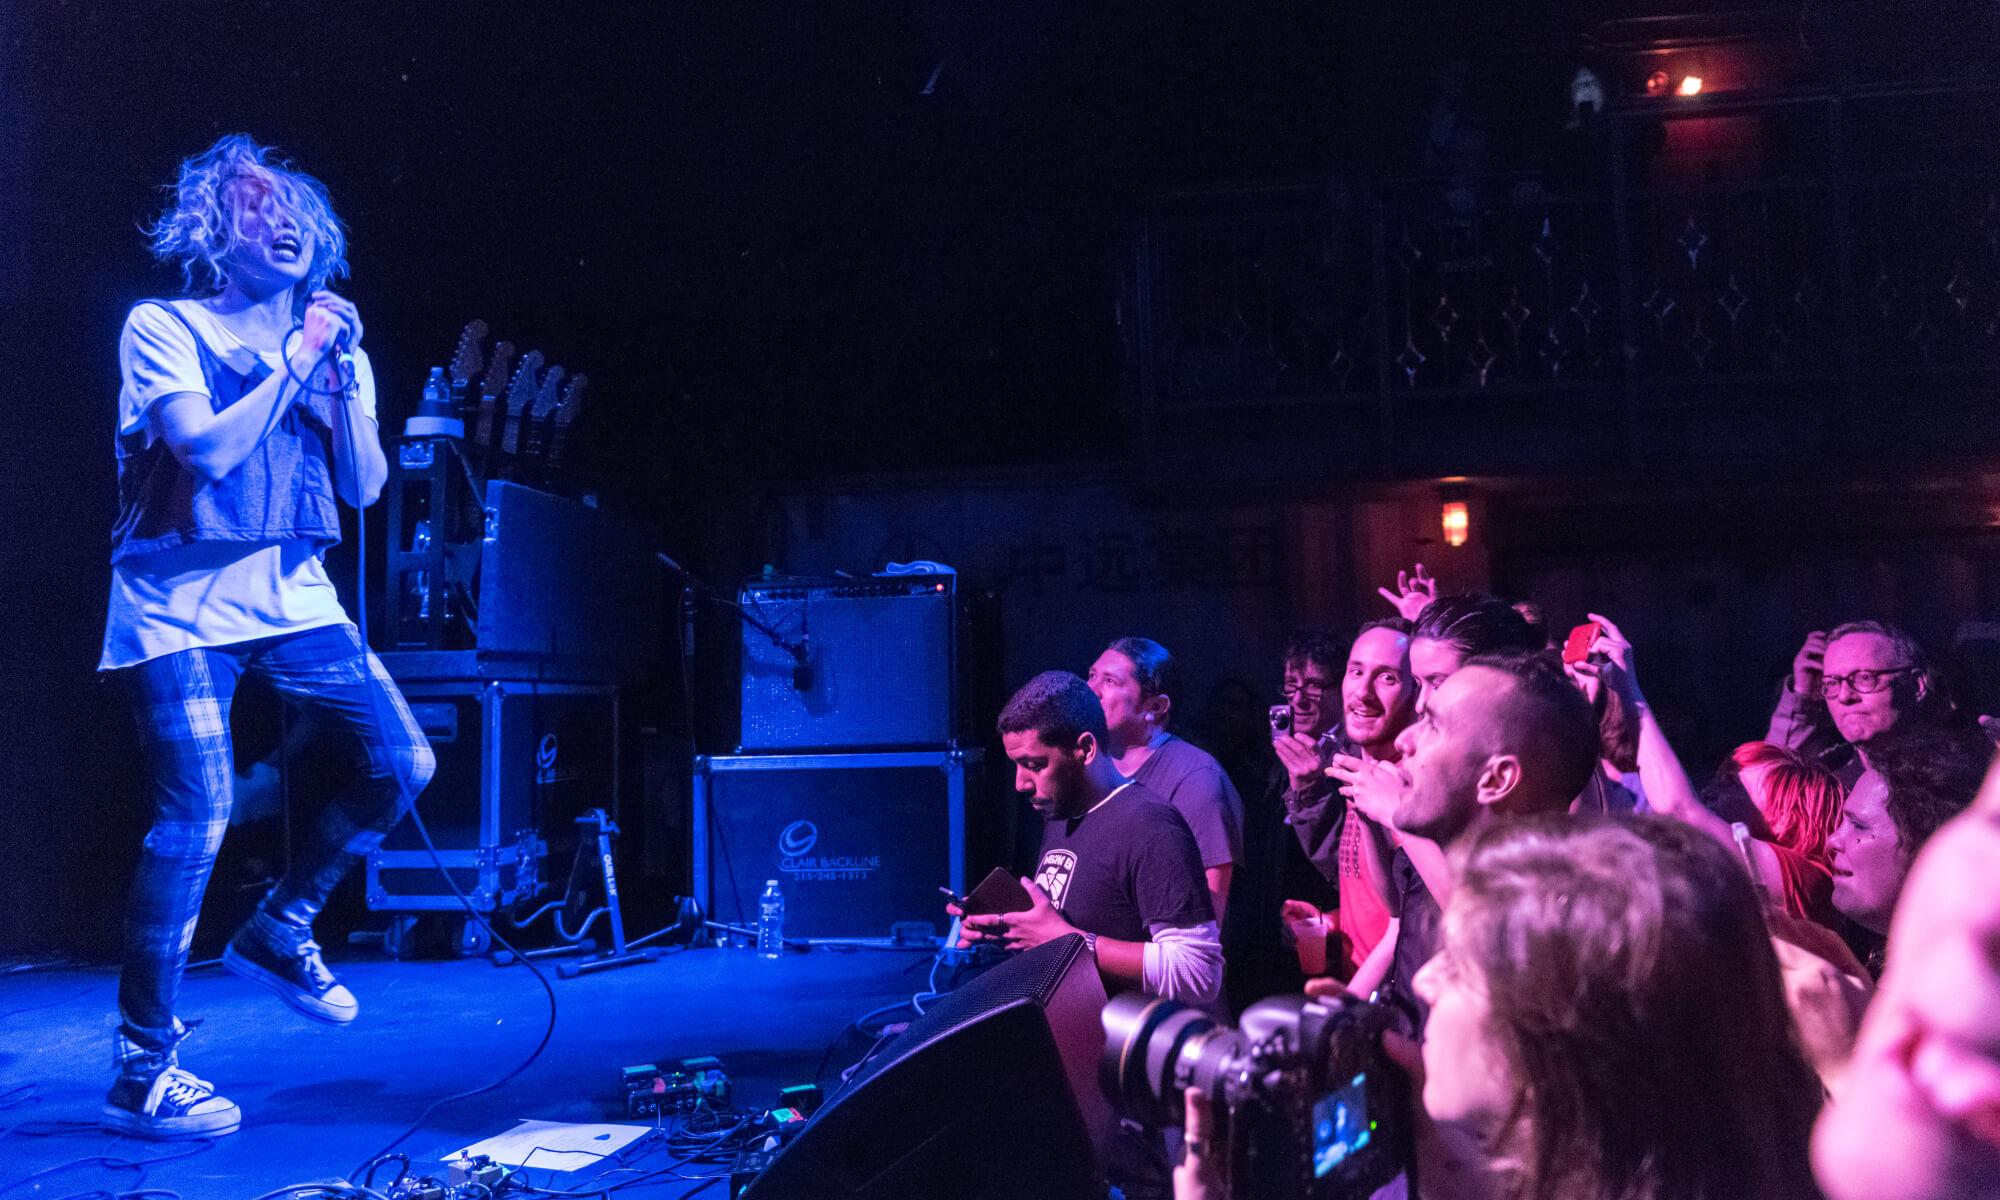 Concert in Brooklyn